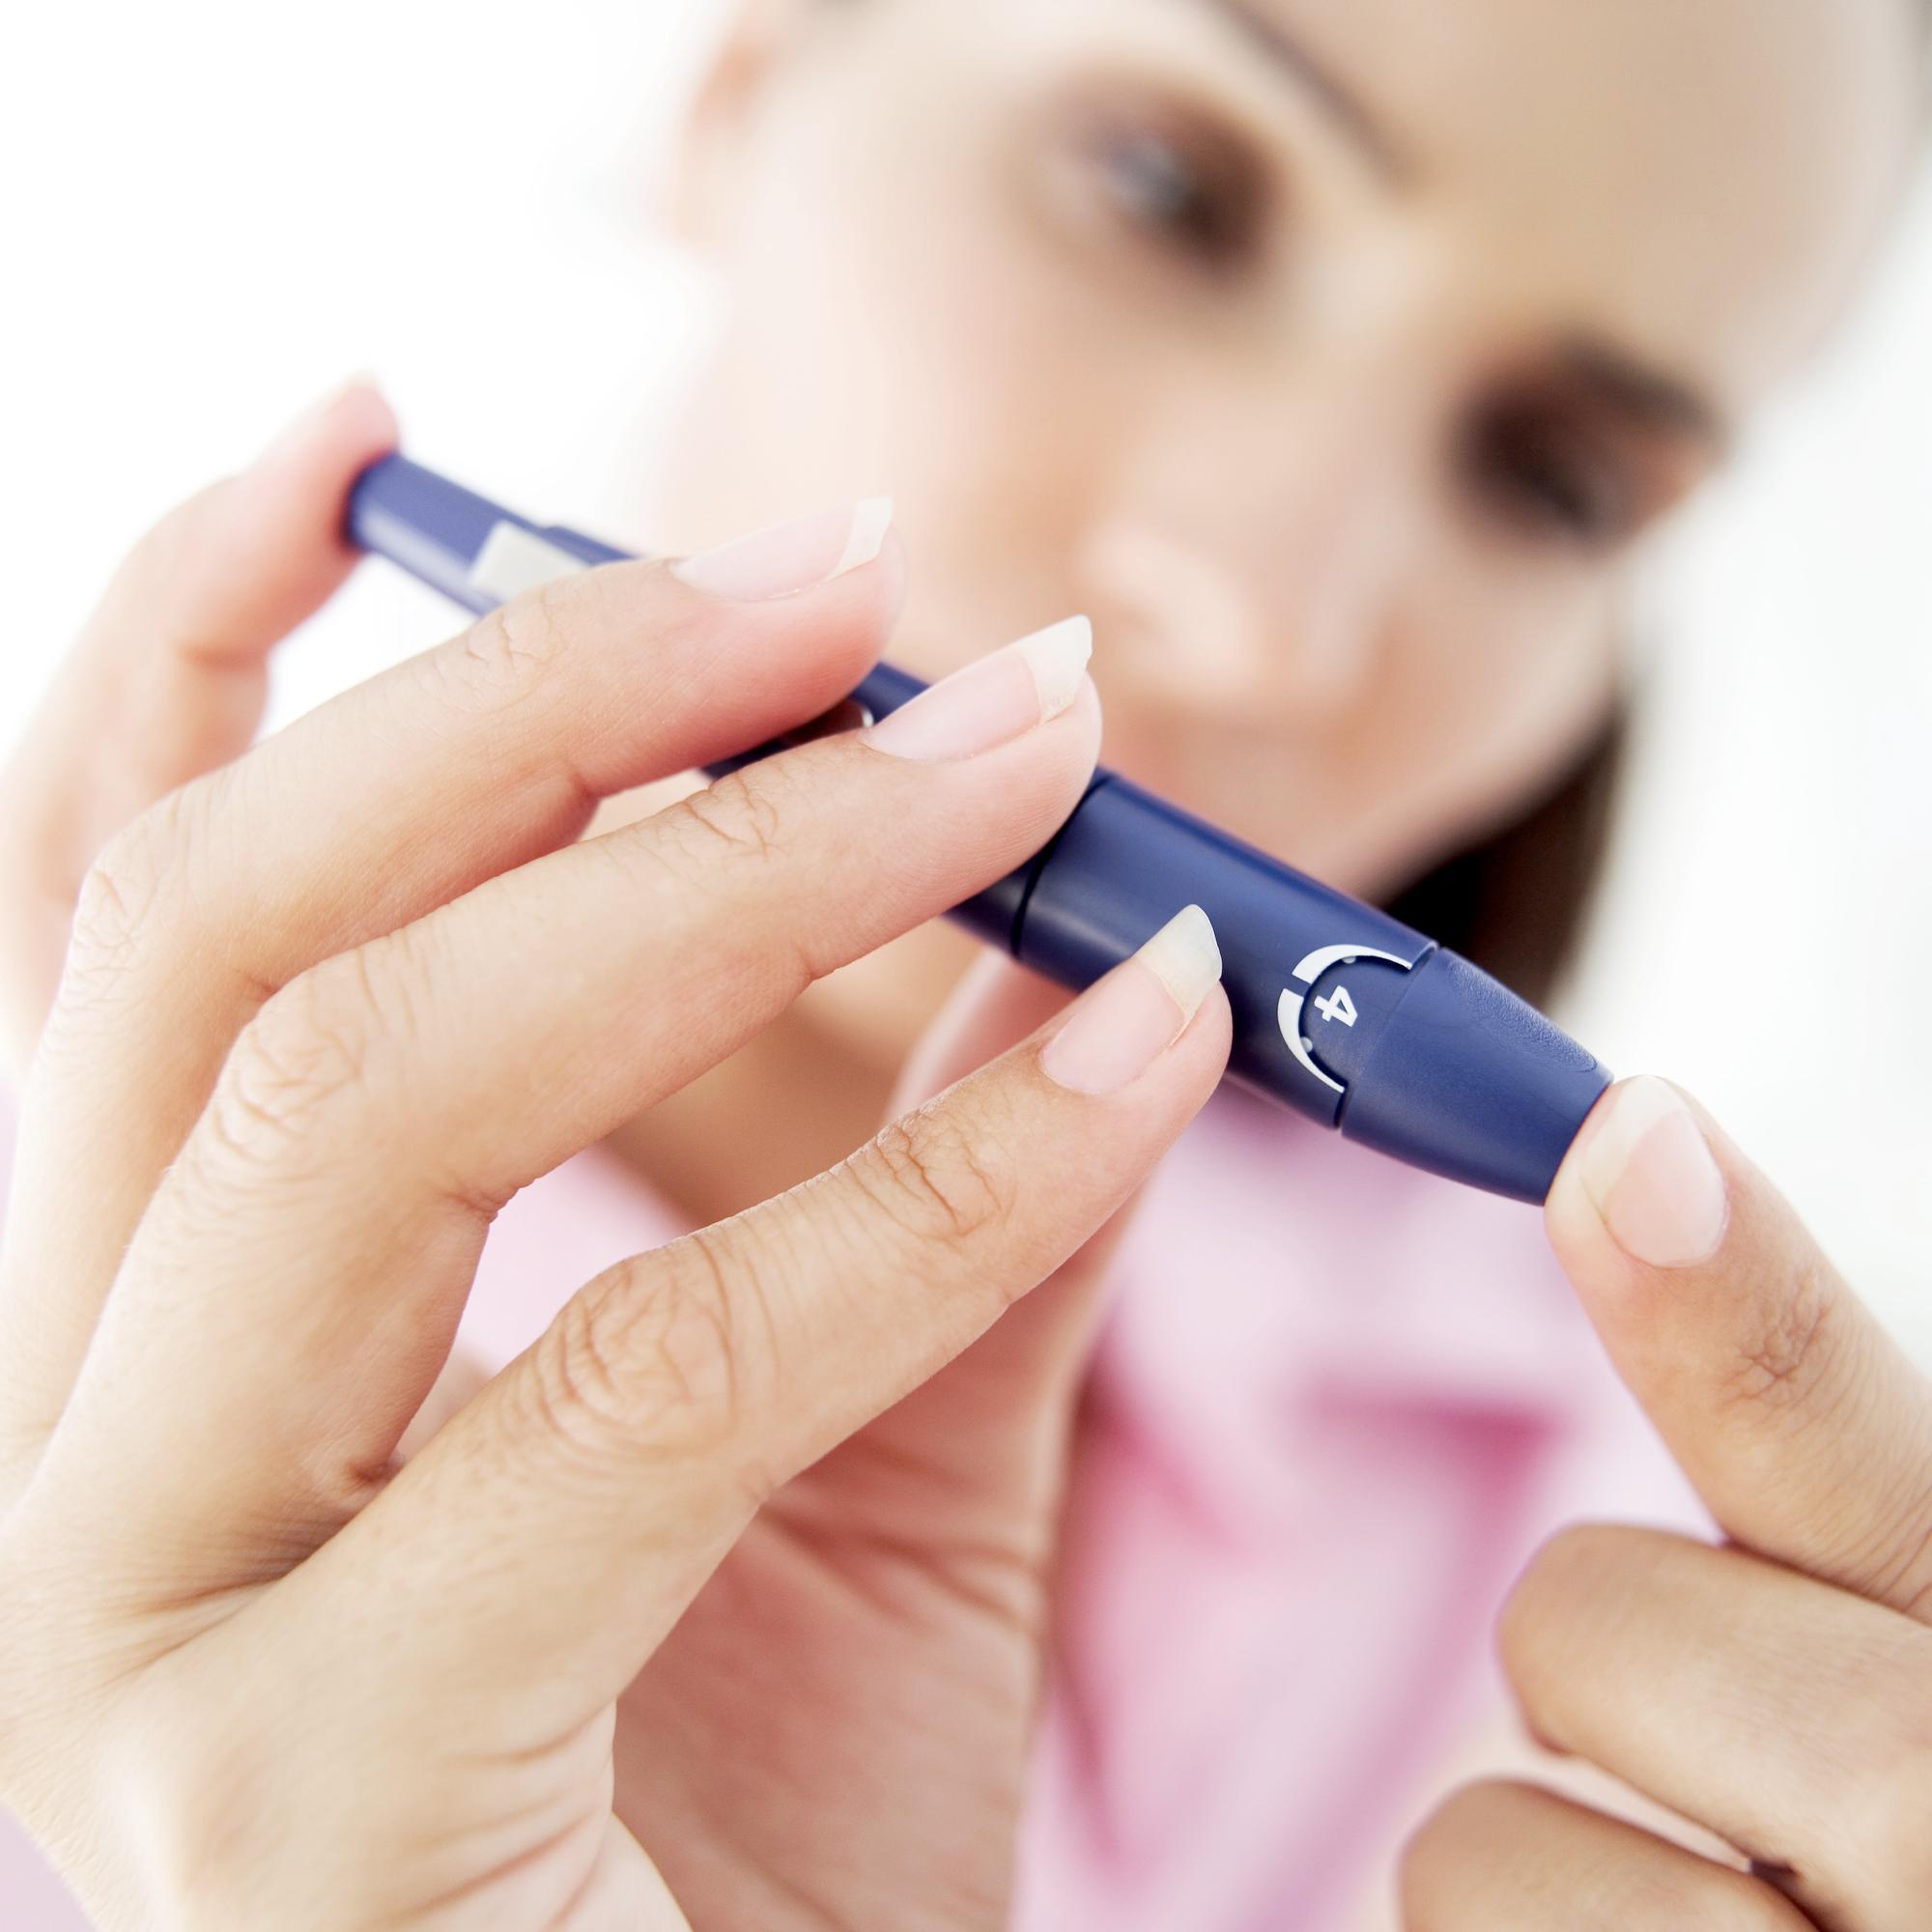 iho oireet raskausdiabetes